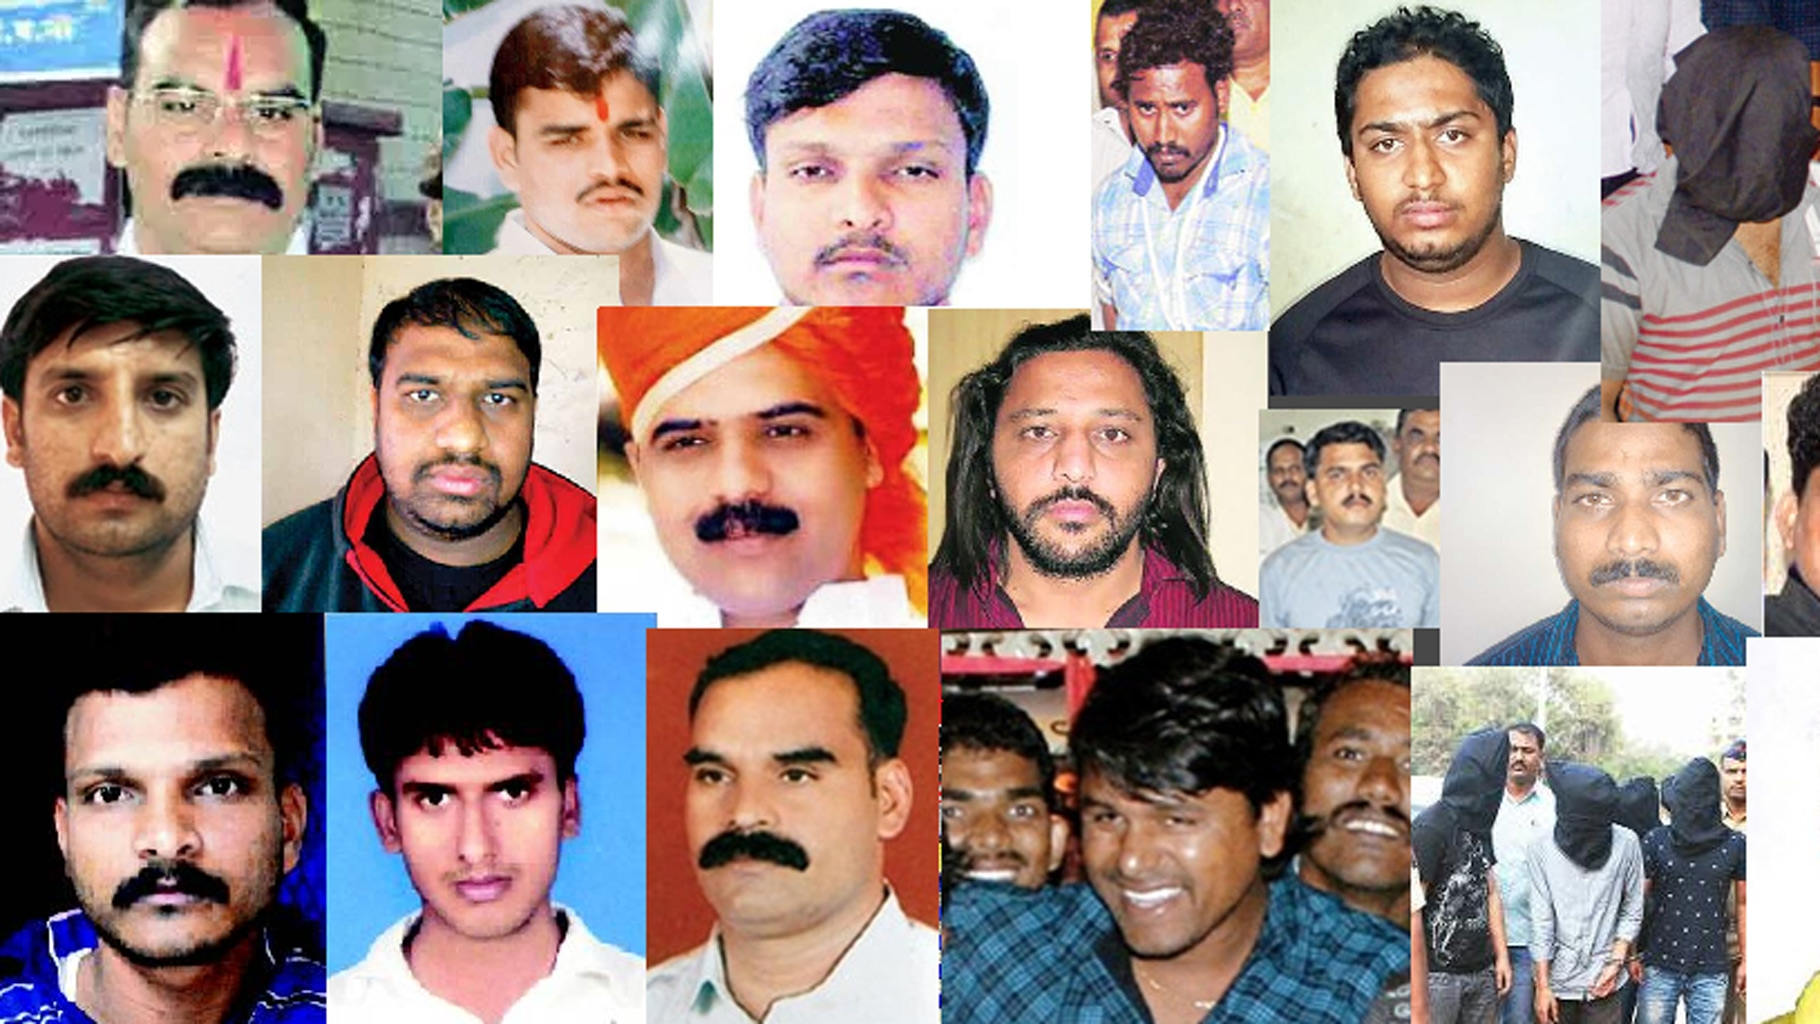 Gangs of Pune: The New Underworld Hotspot - The Quint